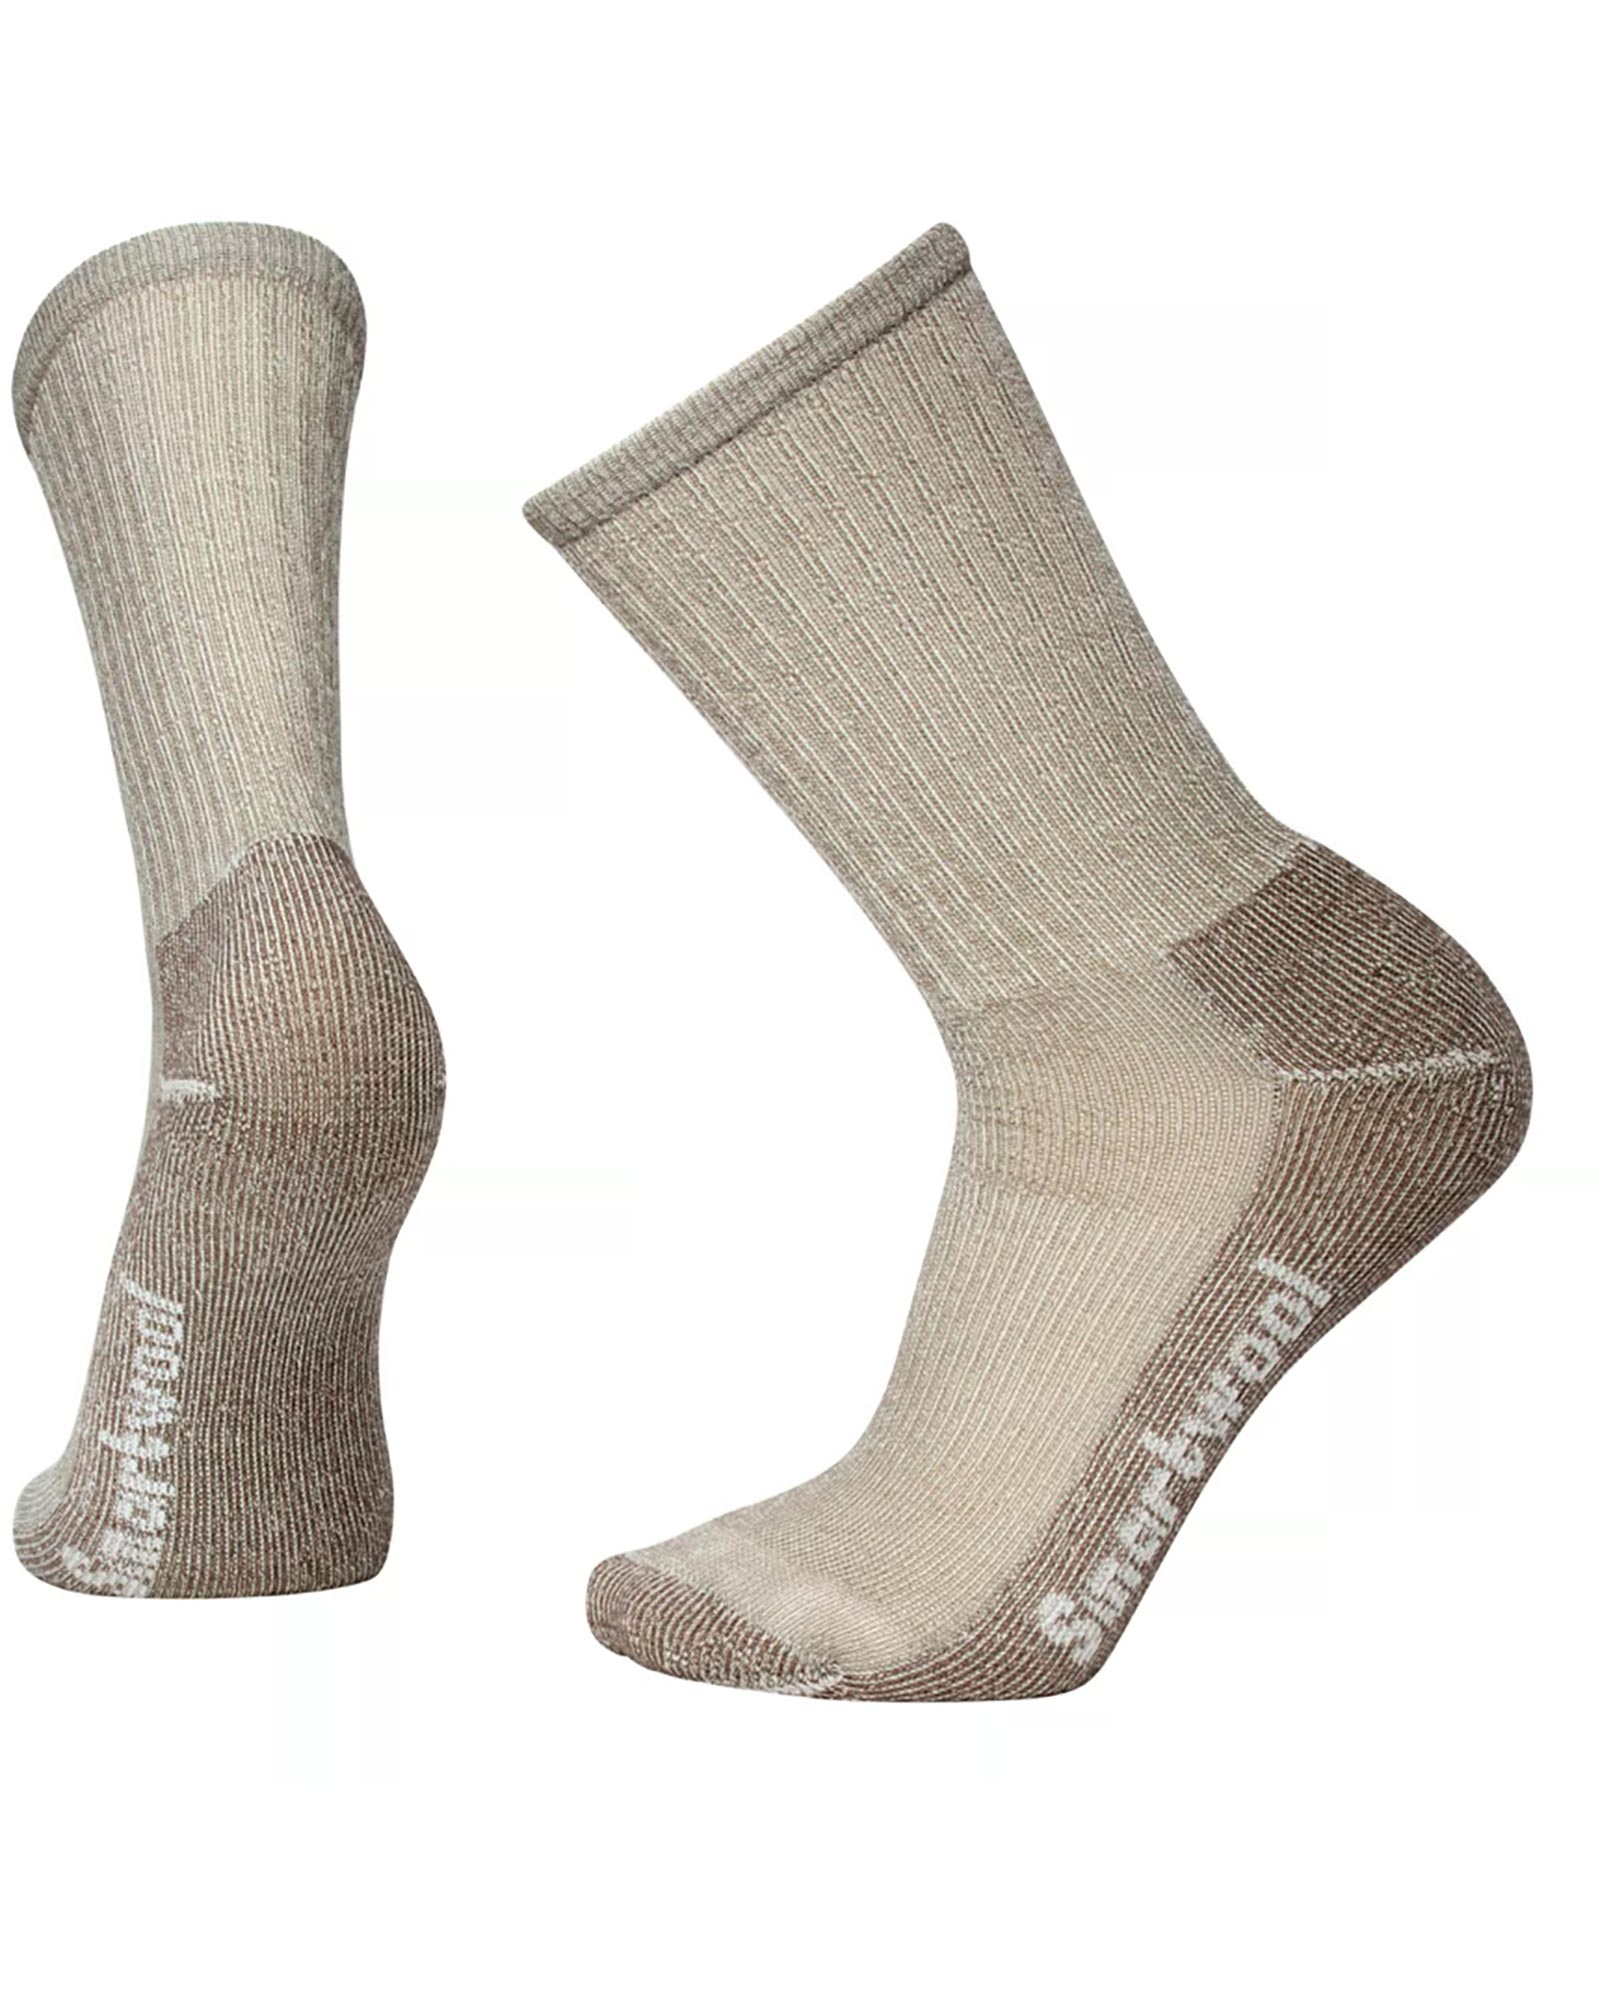 Smartwool Merino Hiking Light Crew Socks 0